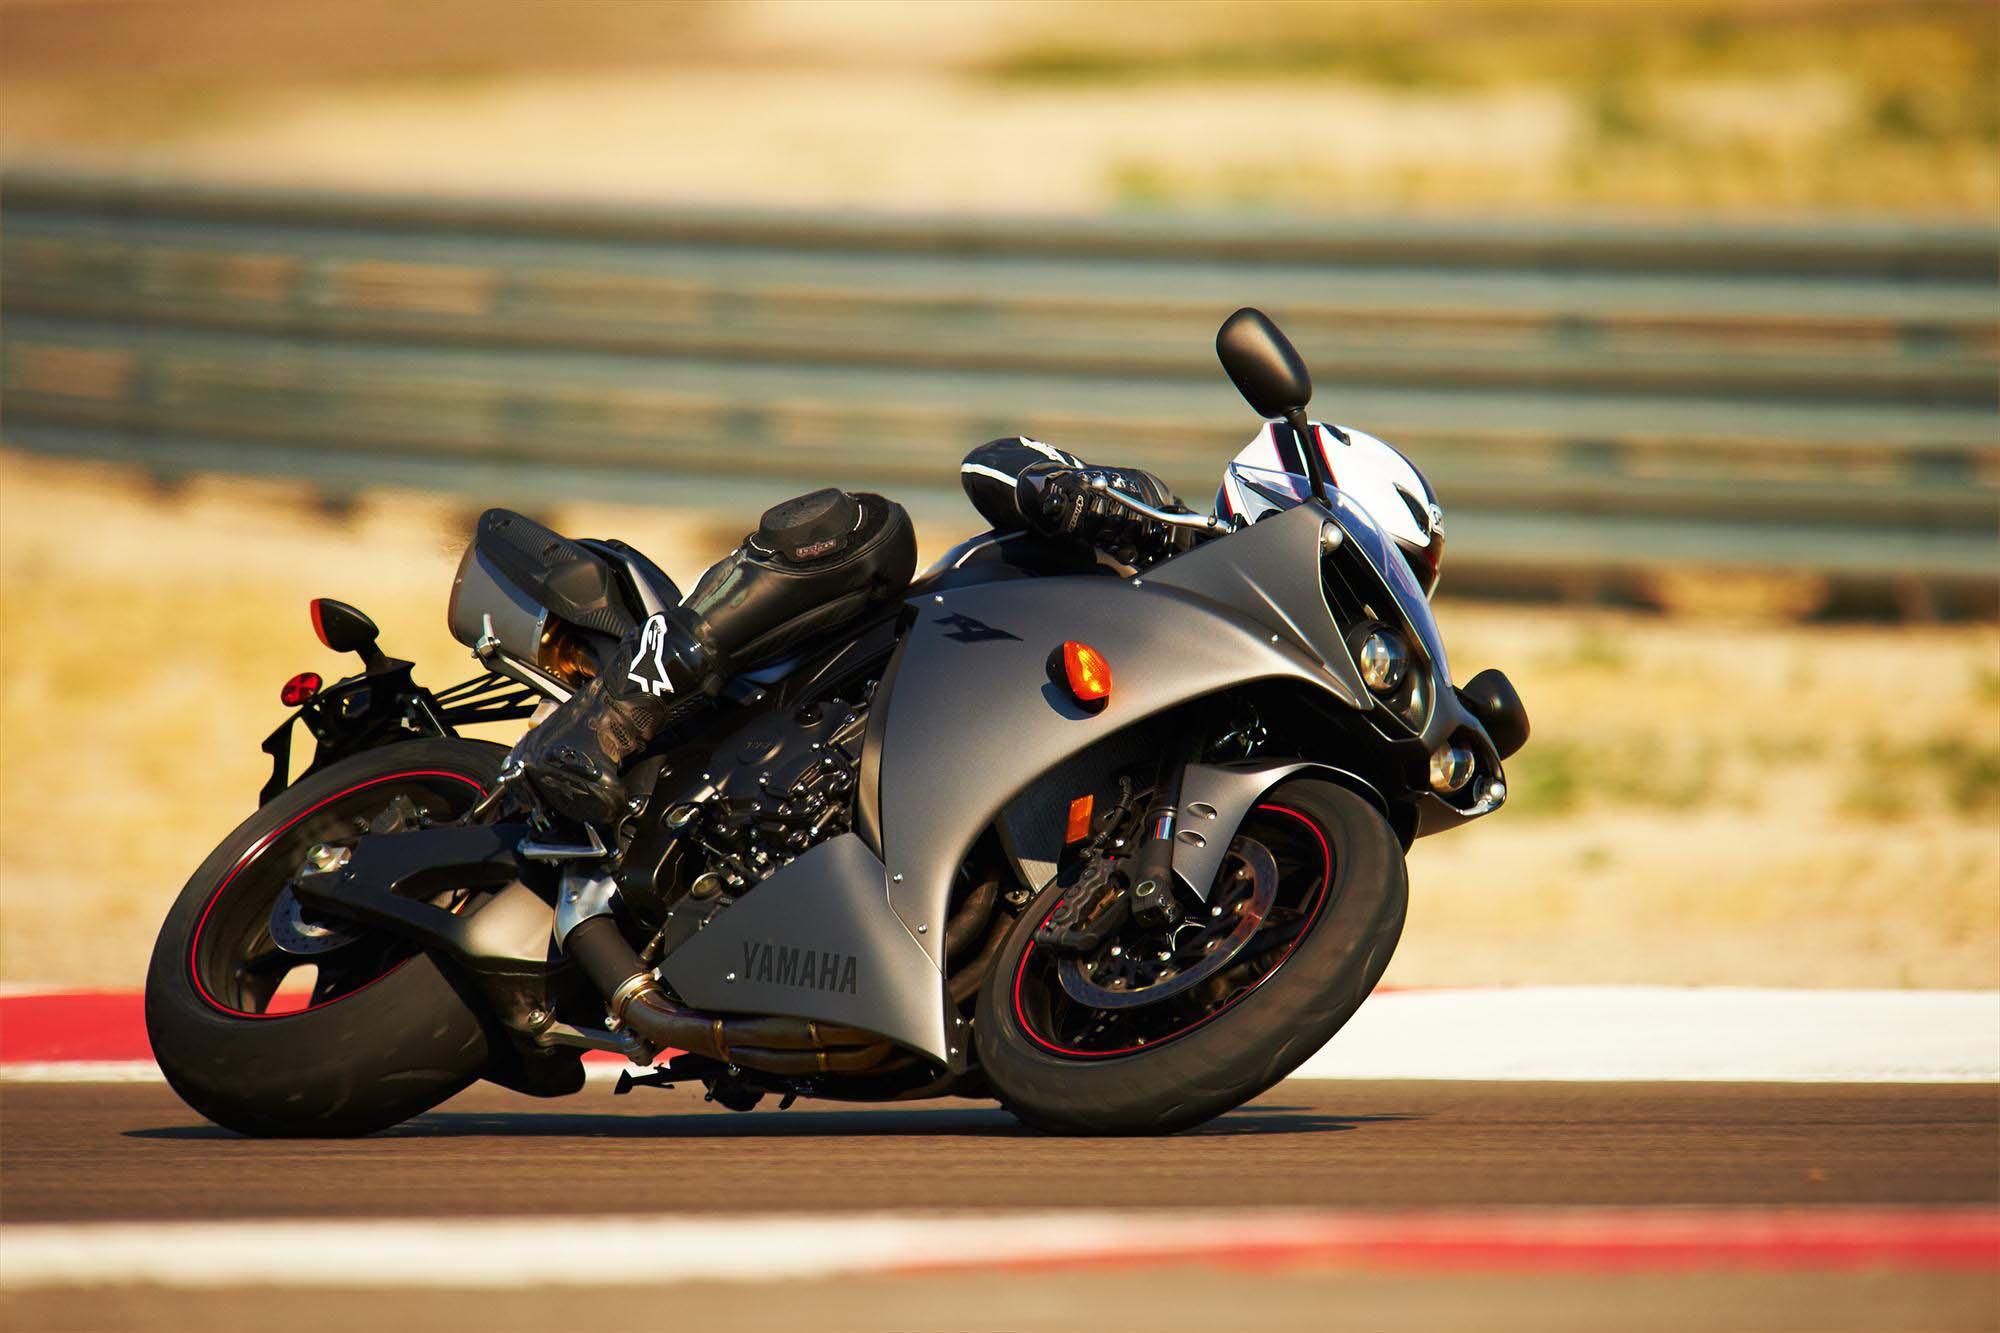 Hd background yamaha yzf r1 sport bike black and gold wallpaper - 2013 Yamaha Yzf R1 09